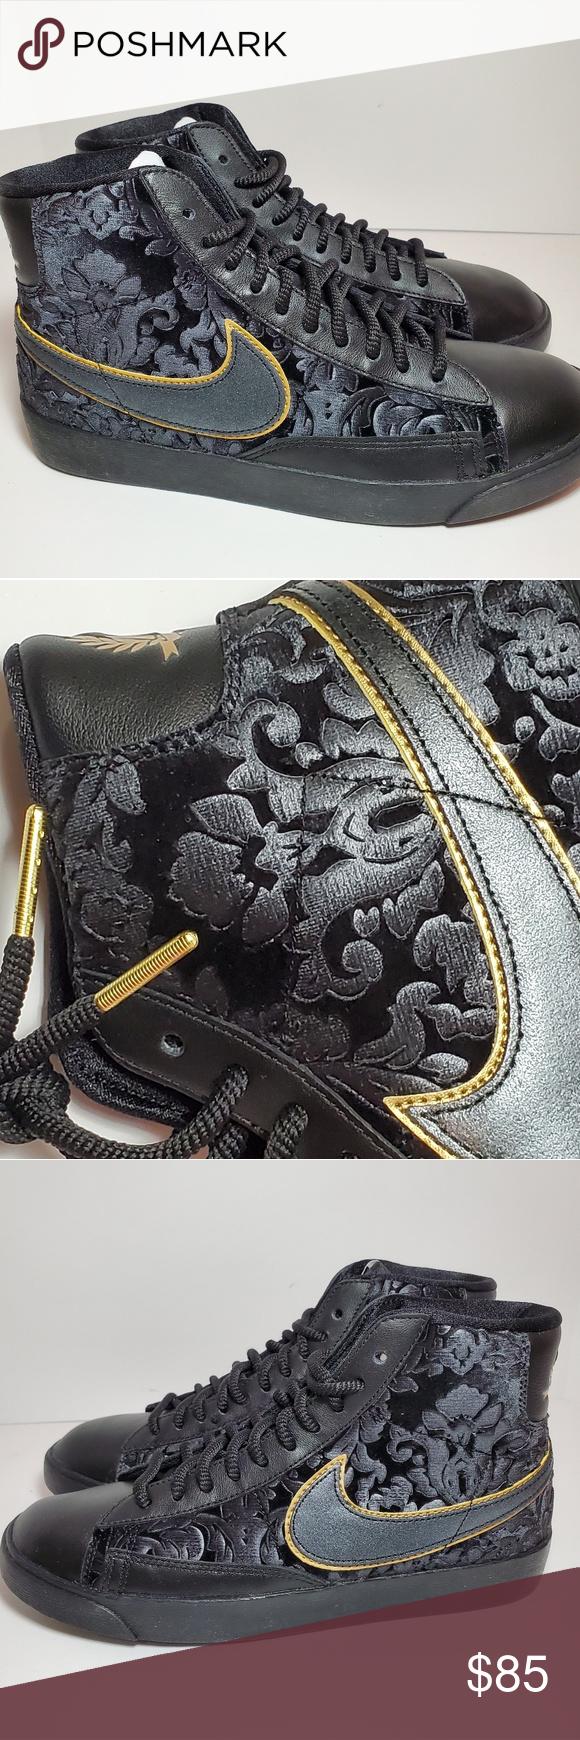 hablar tabaco vela  Women's Nike Blazer Mid Velvet Sz 7.5 or 8.5 DS | Nike blazer, Nike women,  Gold fashion